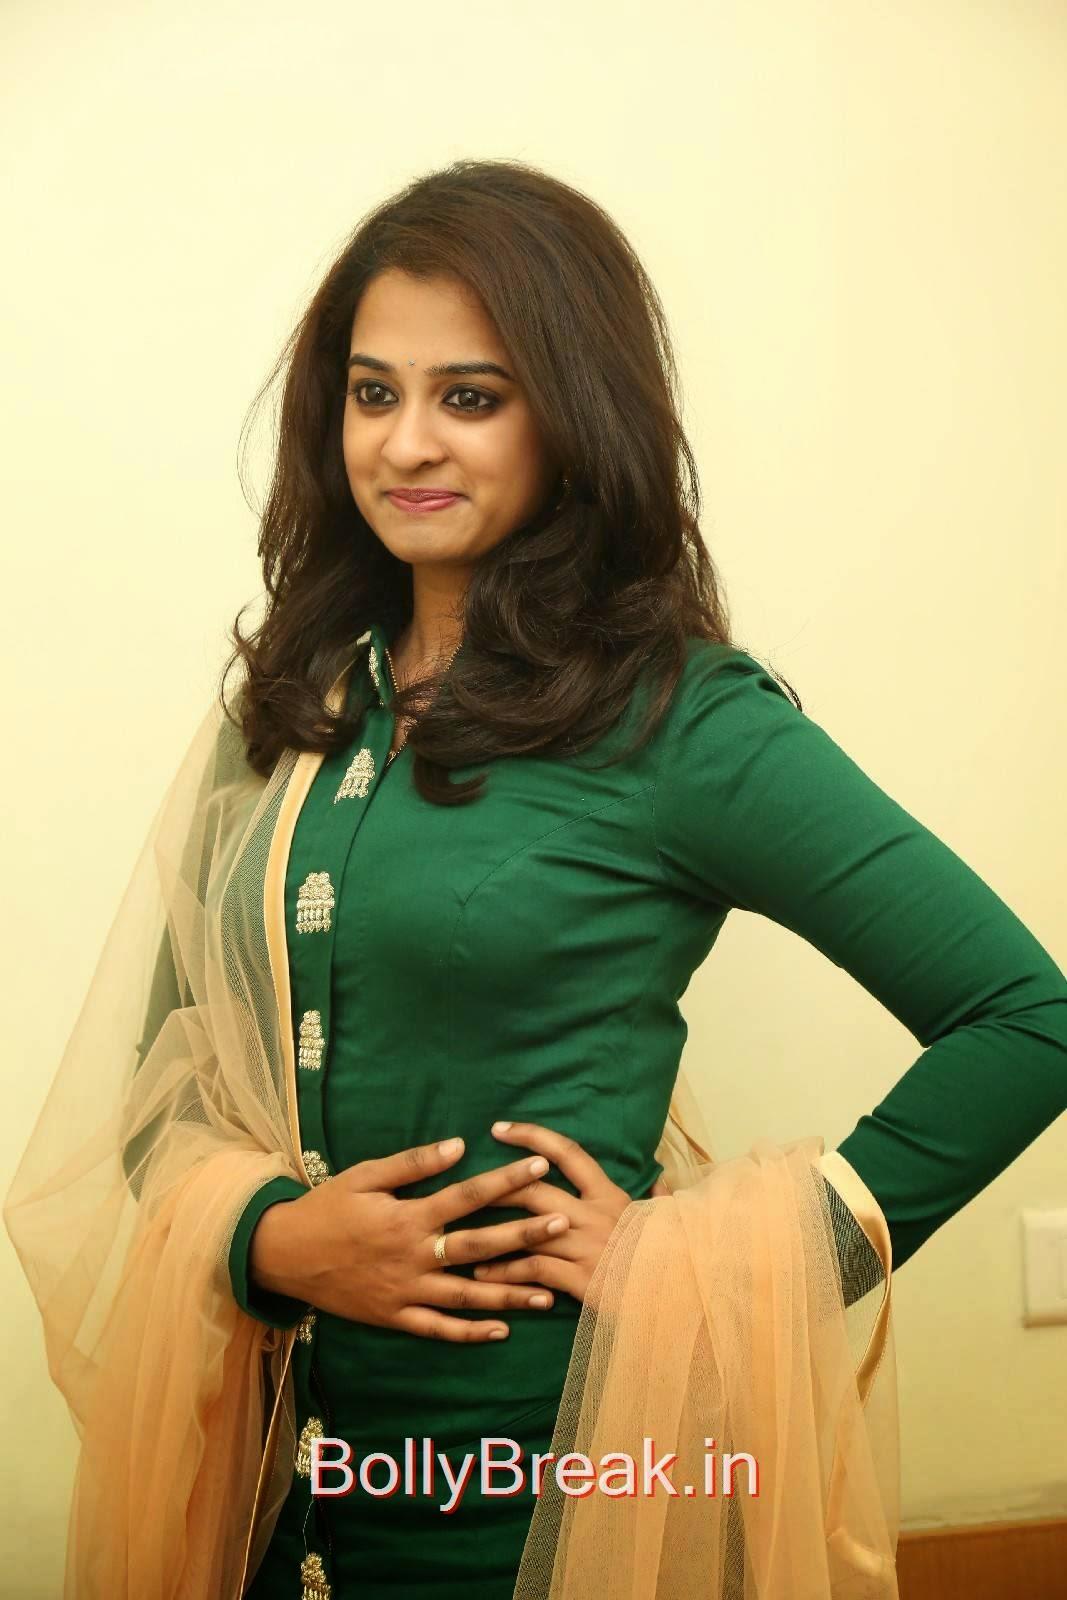 Actress Nanditha Hot Hd Images In Punjabi Green Suit - 12 Pics-7277